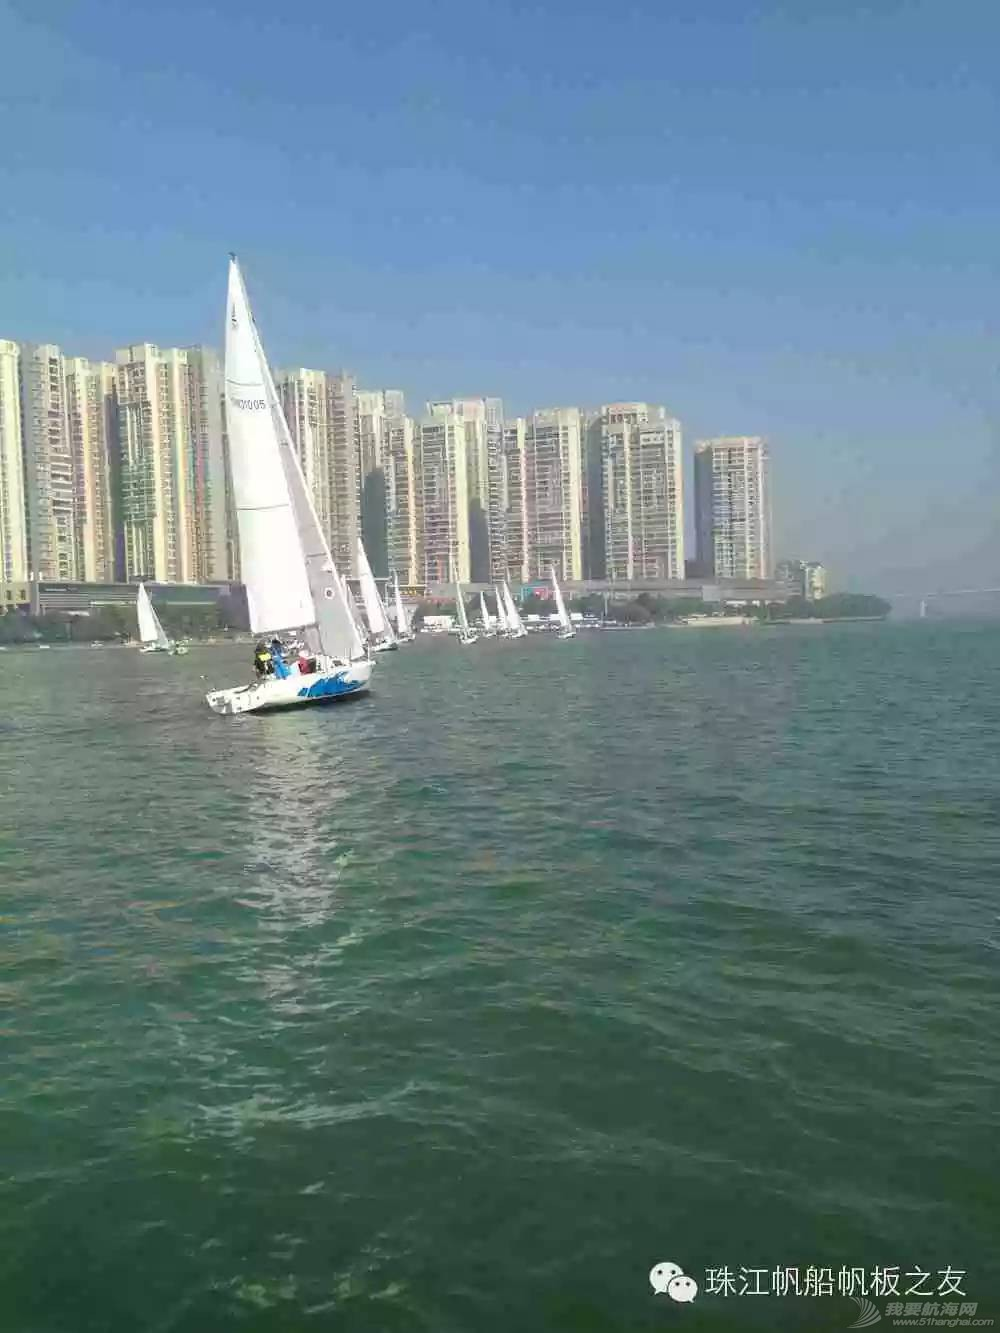 广州帆协在柳州第五届帆船赛 cad5507e2974c4e936e9d3bfd1e0e0e6.jpg